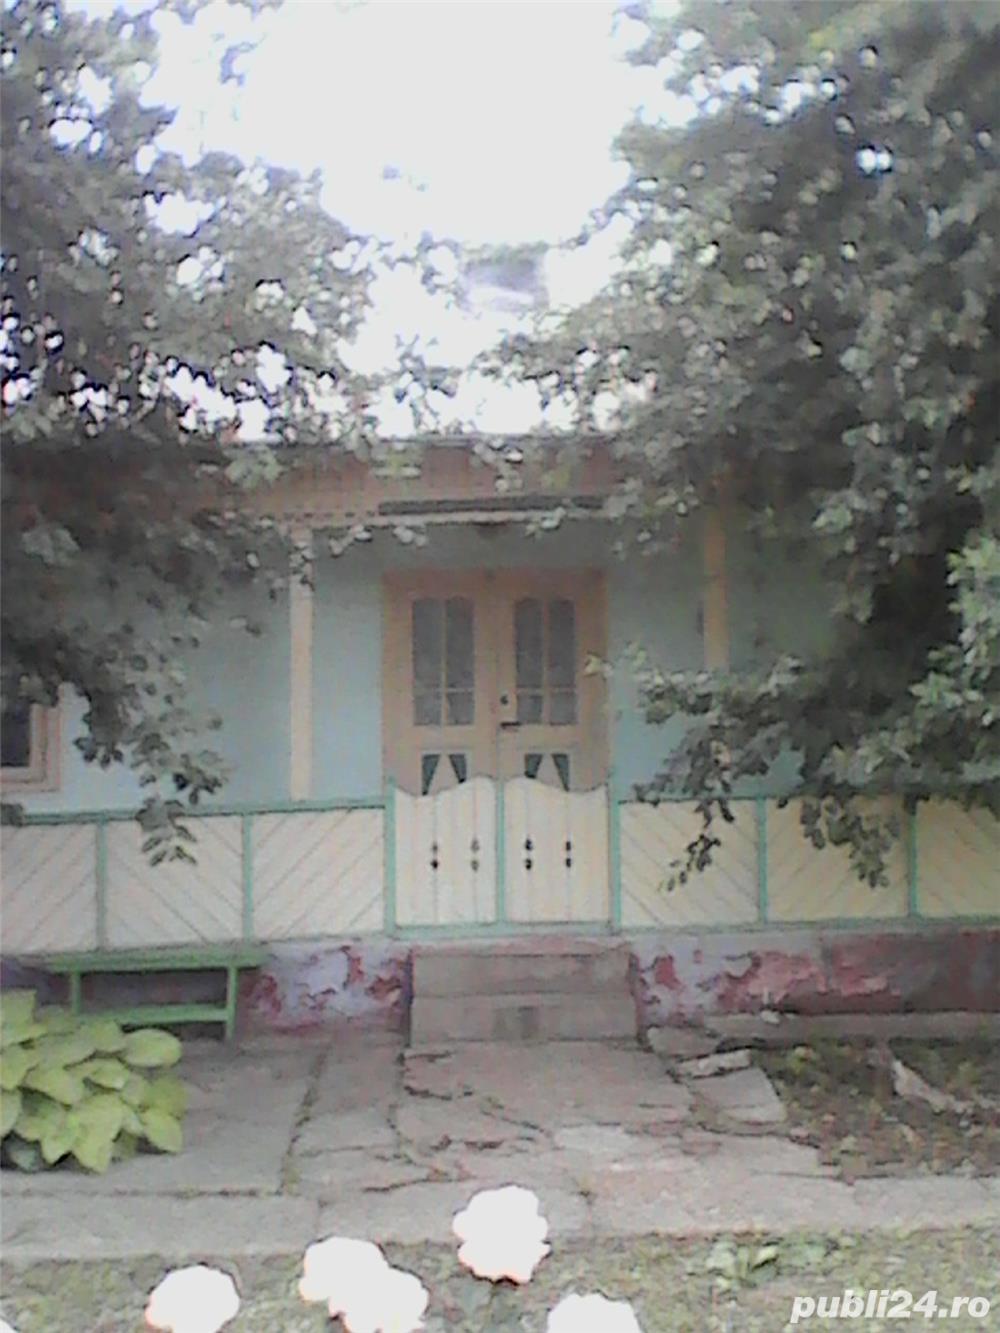 Vand casa in Tulucesti, jud. Galati cu toate utilitatile, 1323 mp si anexe